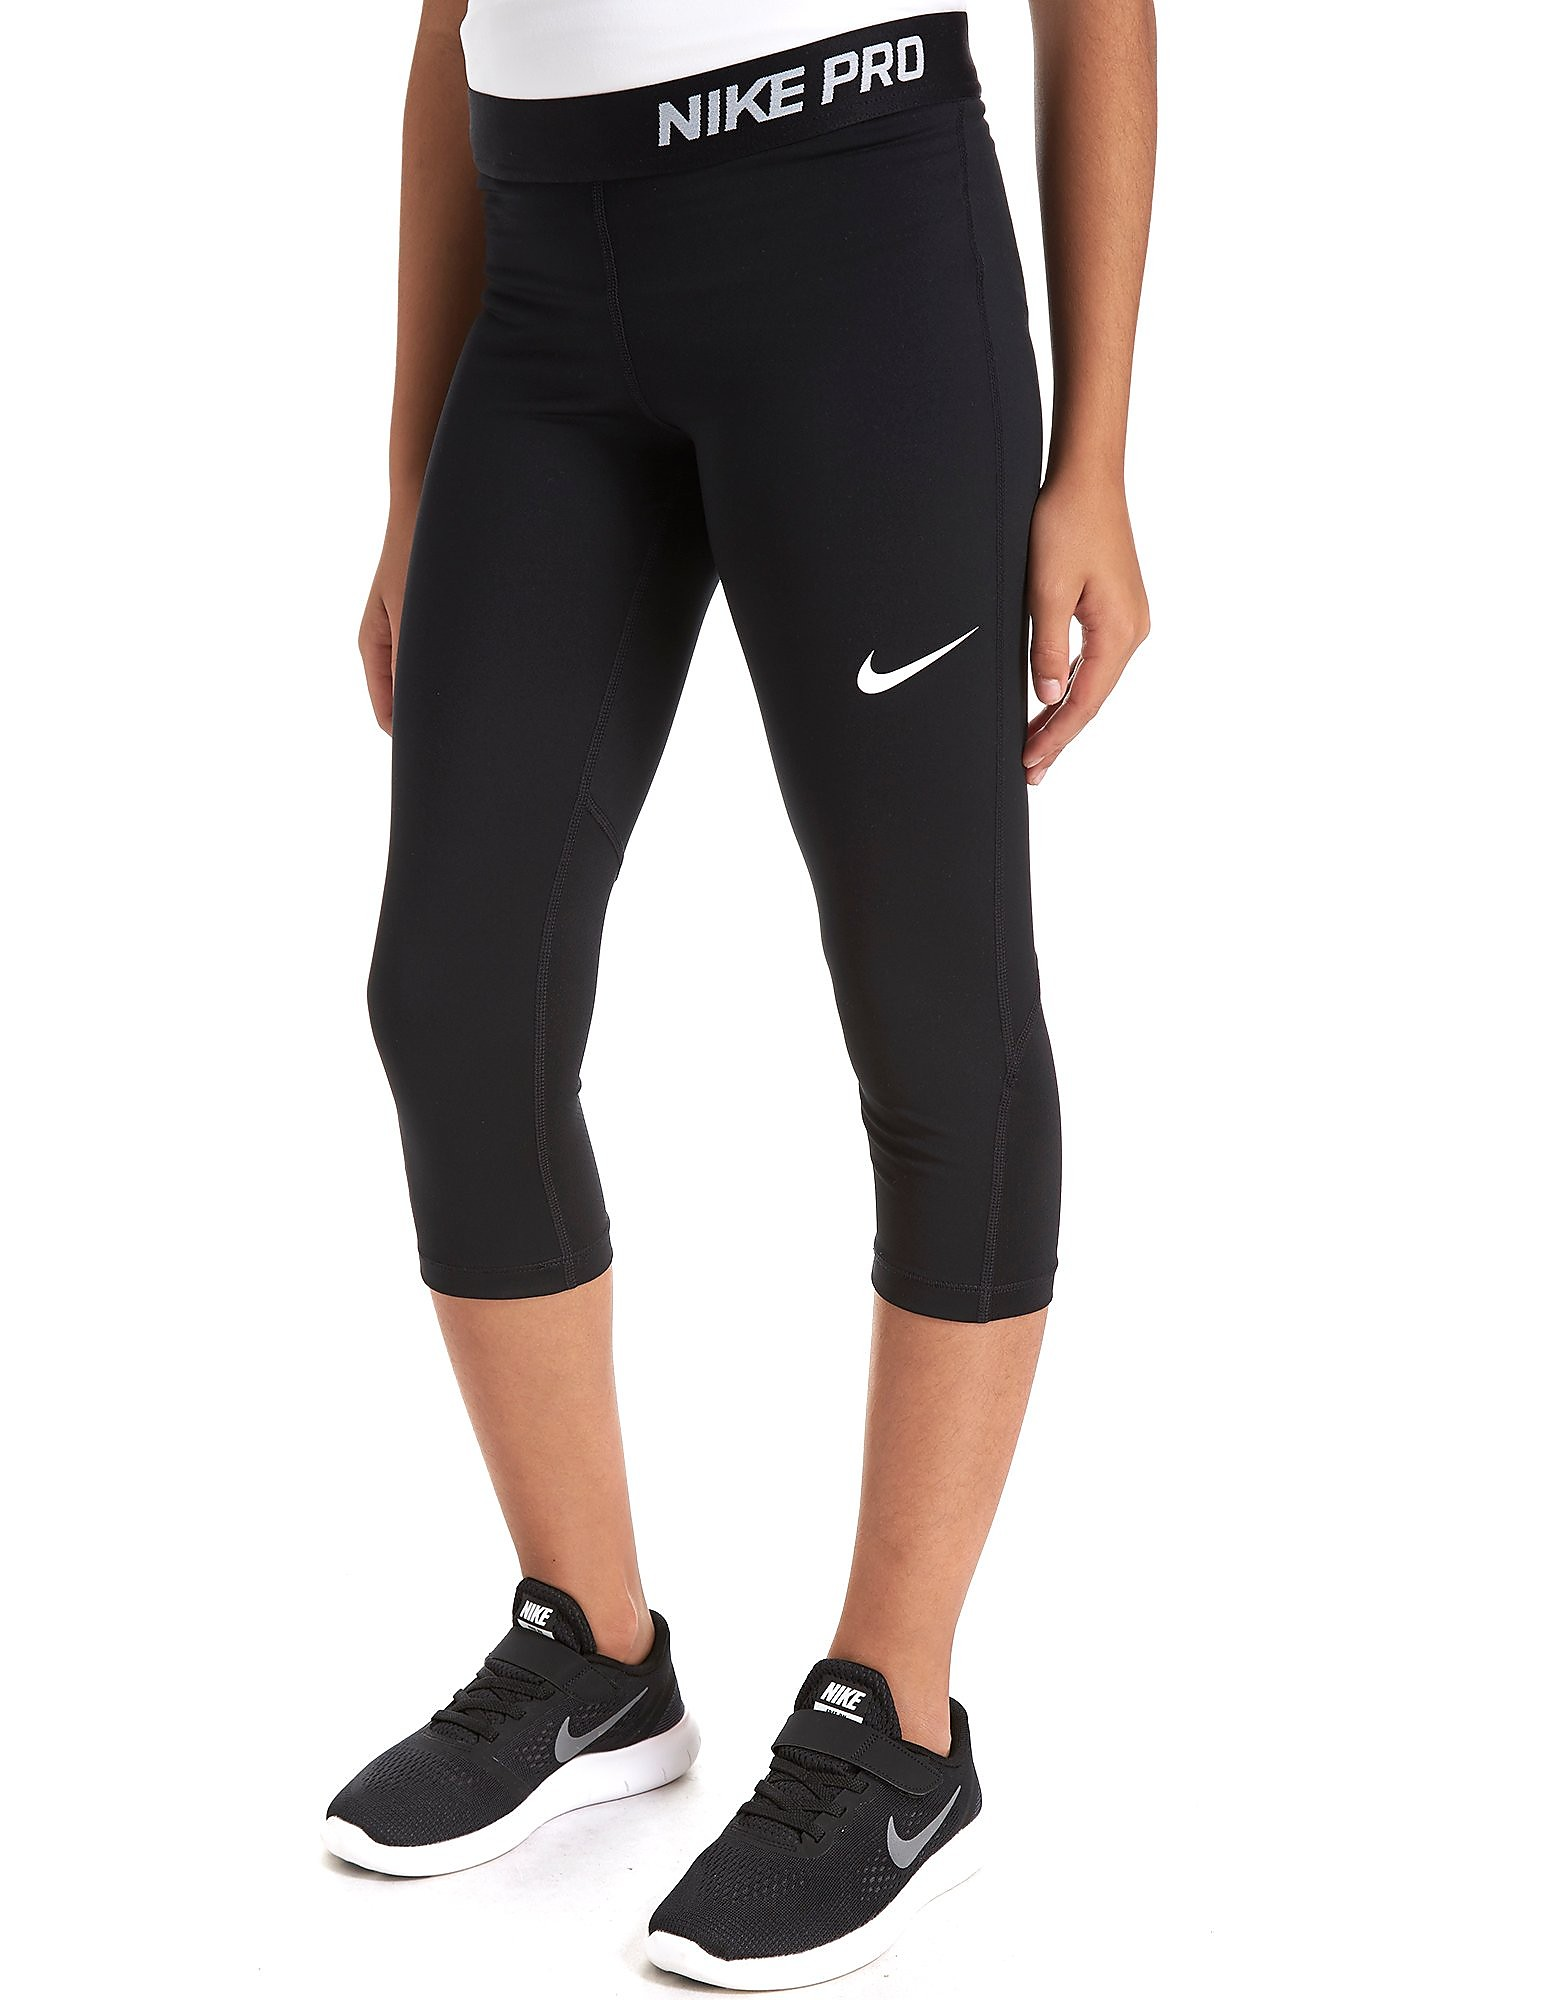 Nike Pro Cool Capri Girl's